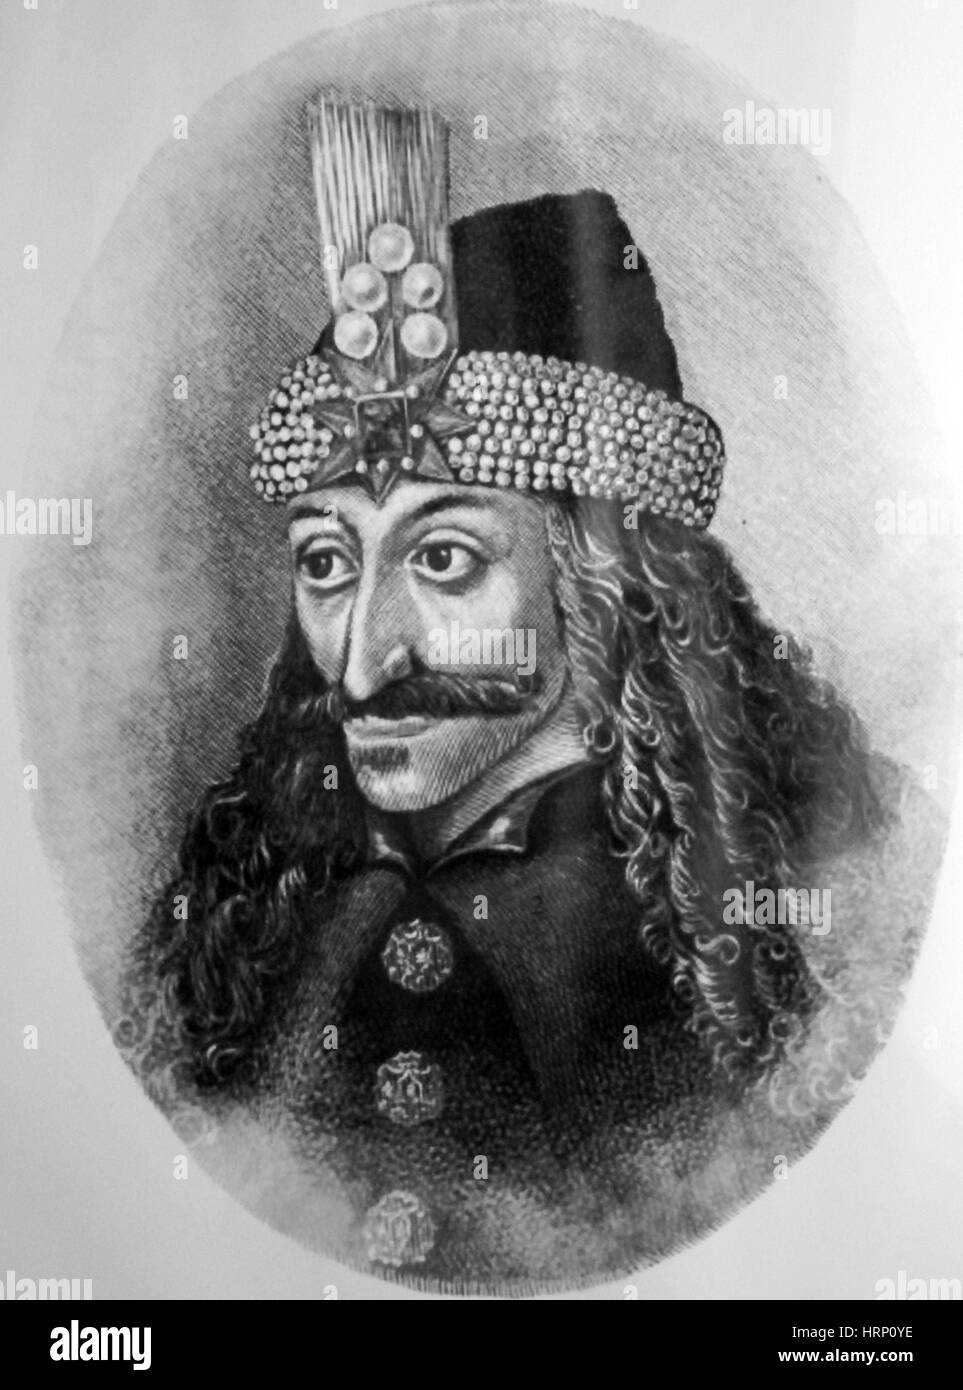 Vlad the Impaler, Prince of Wallachia - Stock Image